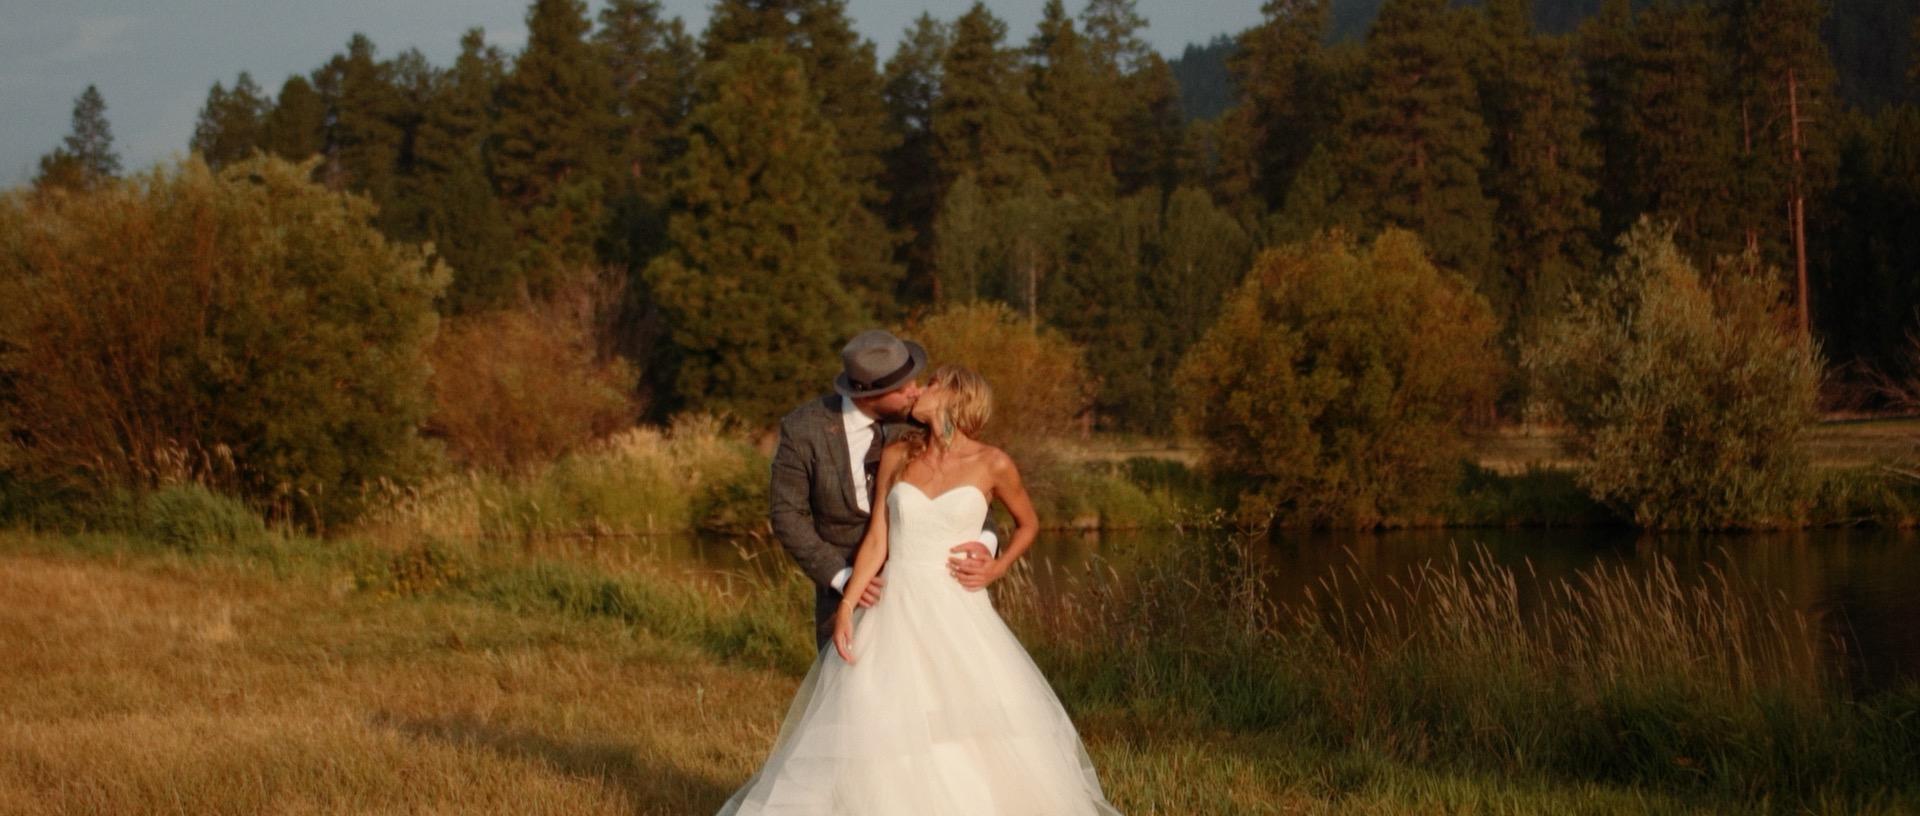 Black Butte Ranch Wedding 11.jpg